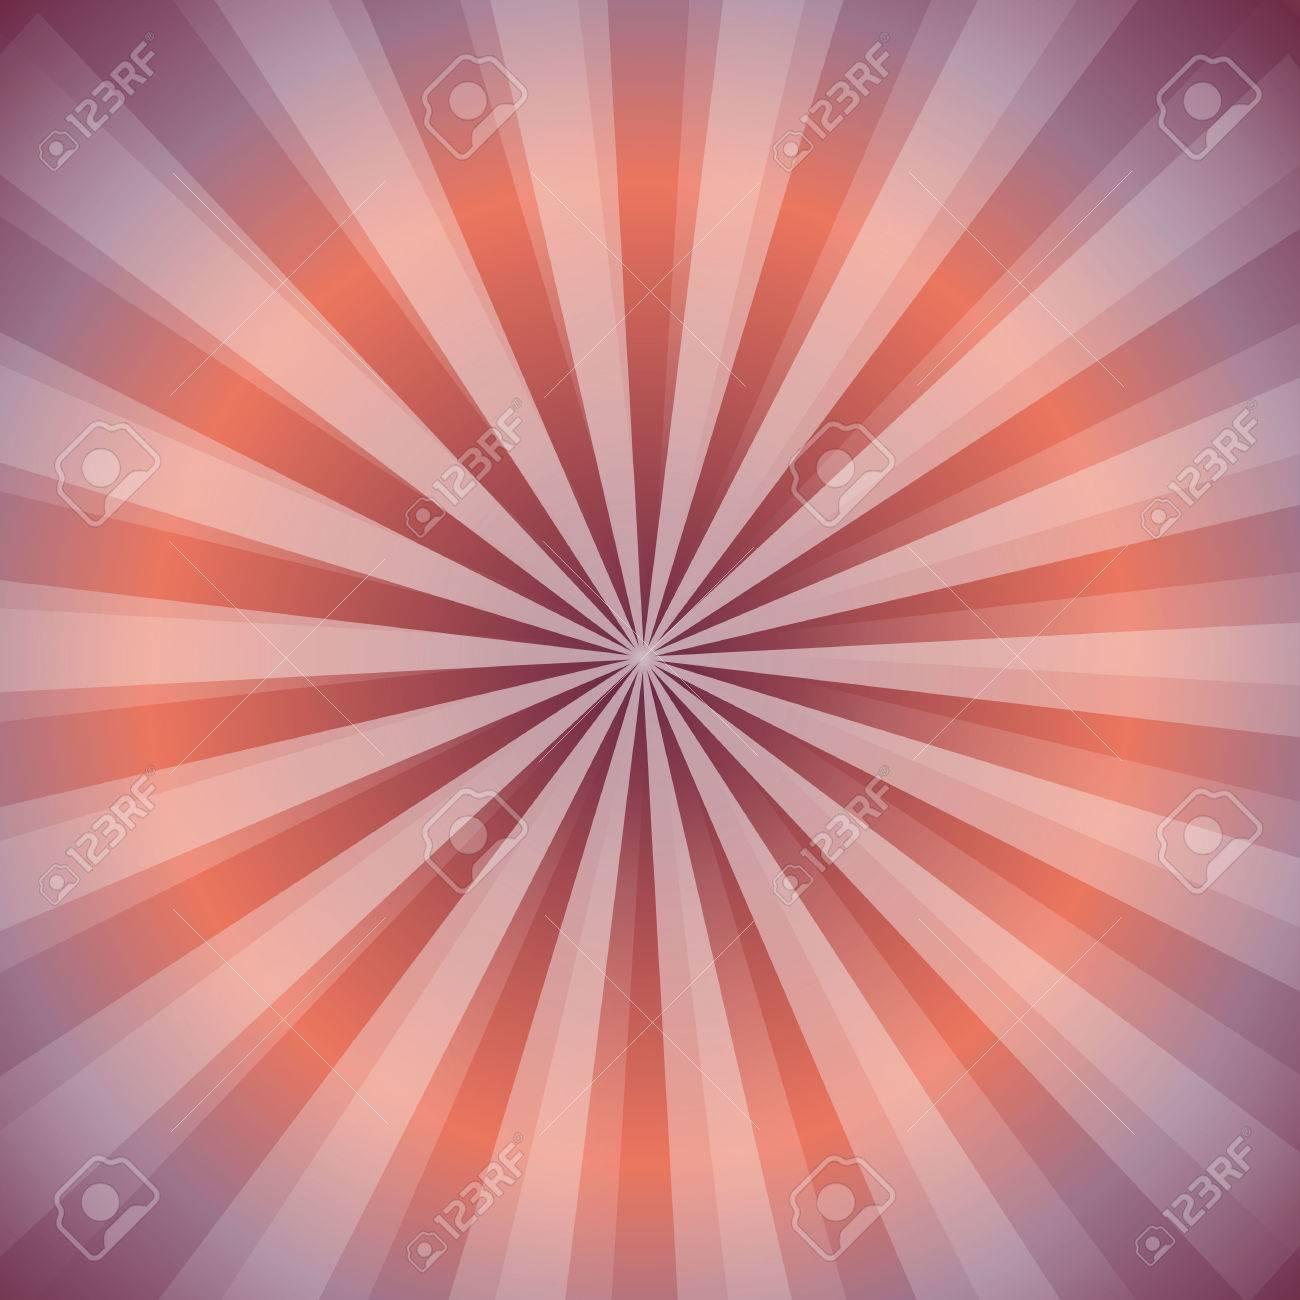 b20098771fc shiny sun ray background. Sun Sunburst Pattern. orange rays summer..